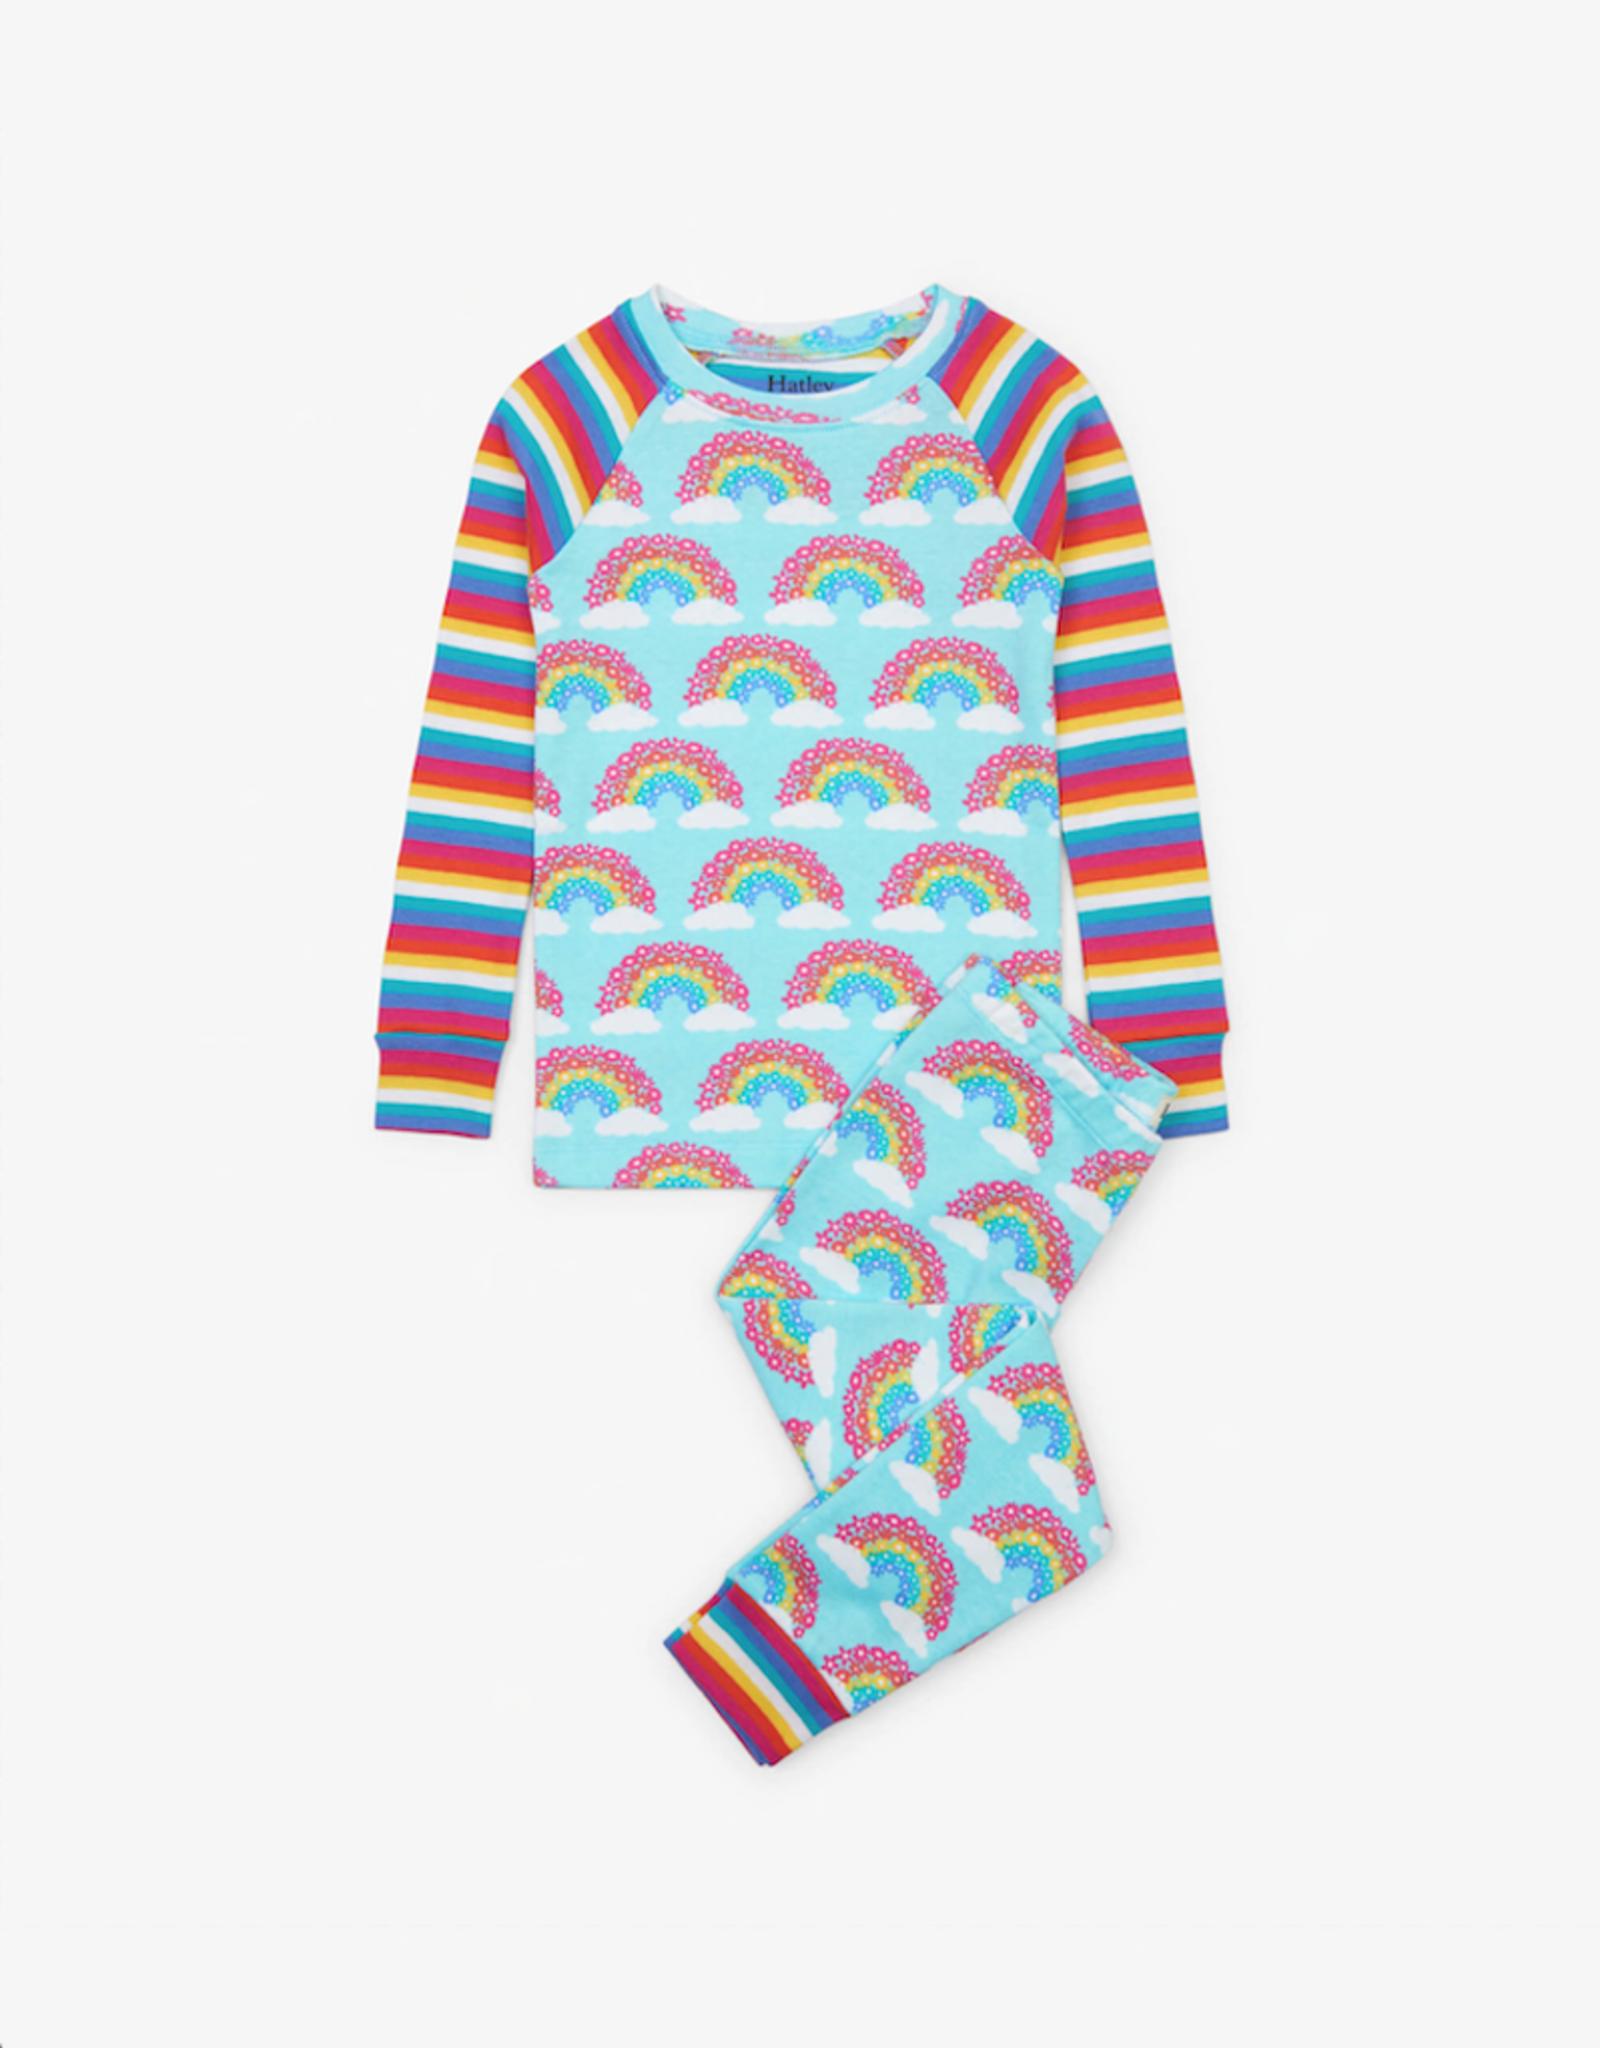 Hatley Rainbow Unicorns Organic Cotton Raglan Pajama Set